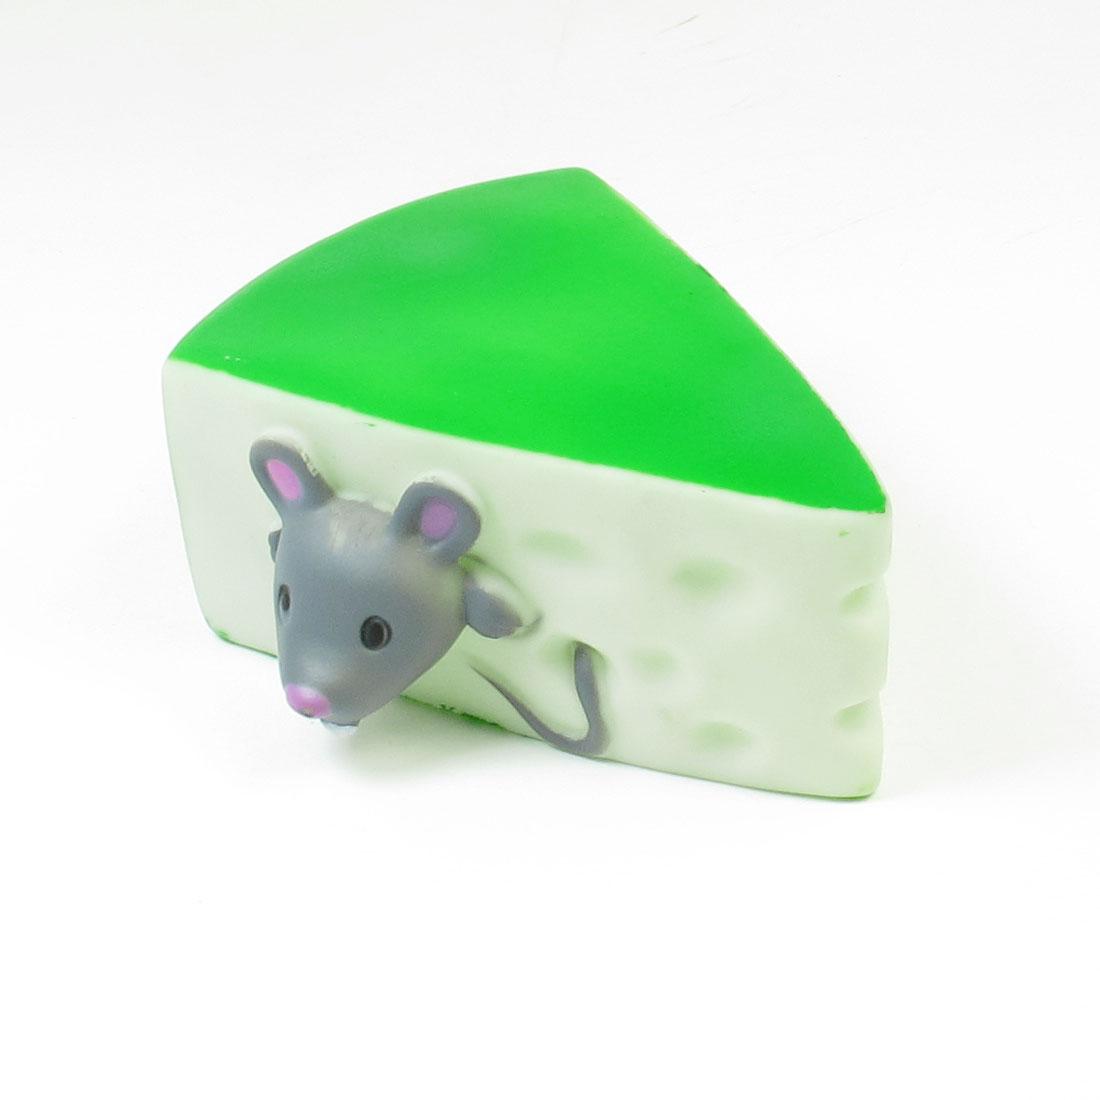 Doggie Puppy Squeeze Squeaker Triangle Sandwich Design Toy Green White